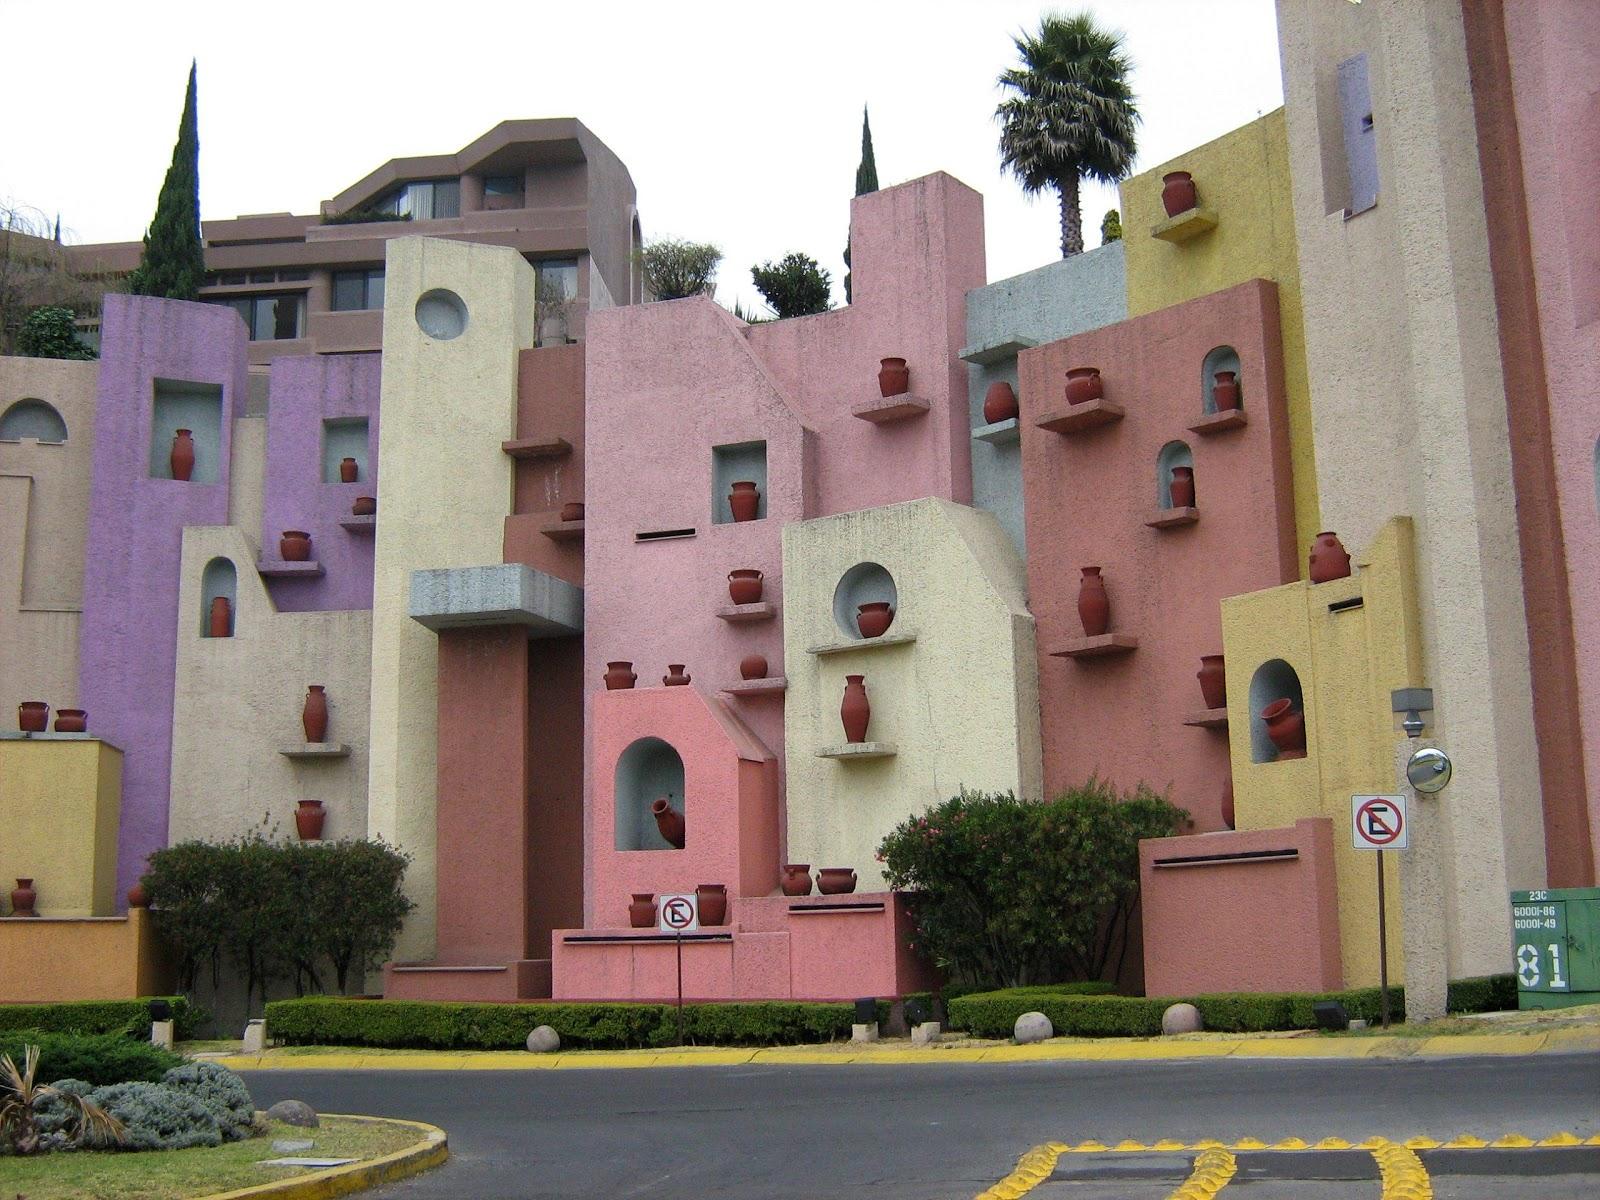 Architecture model galleries 2013 Home architecture in mexico